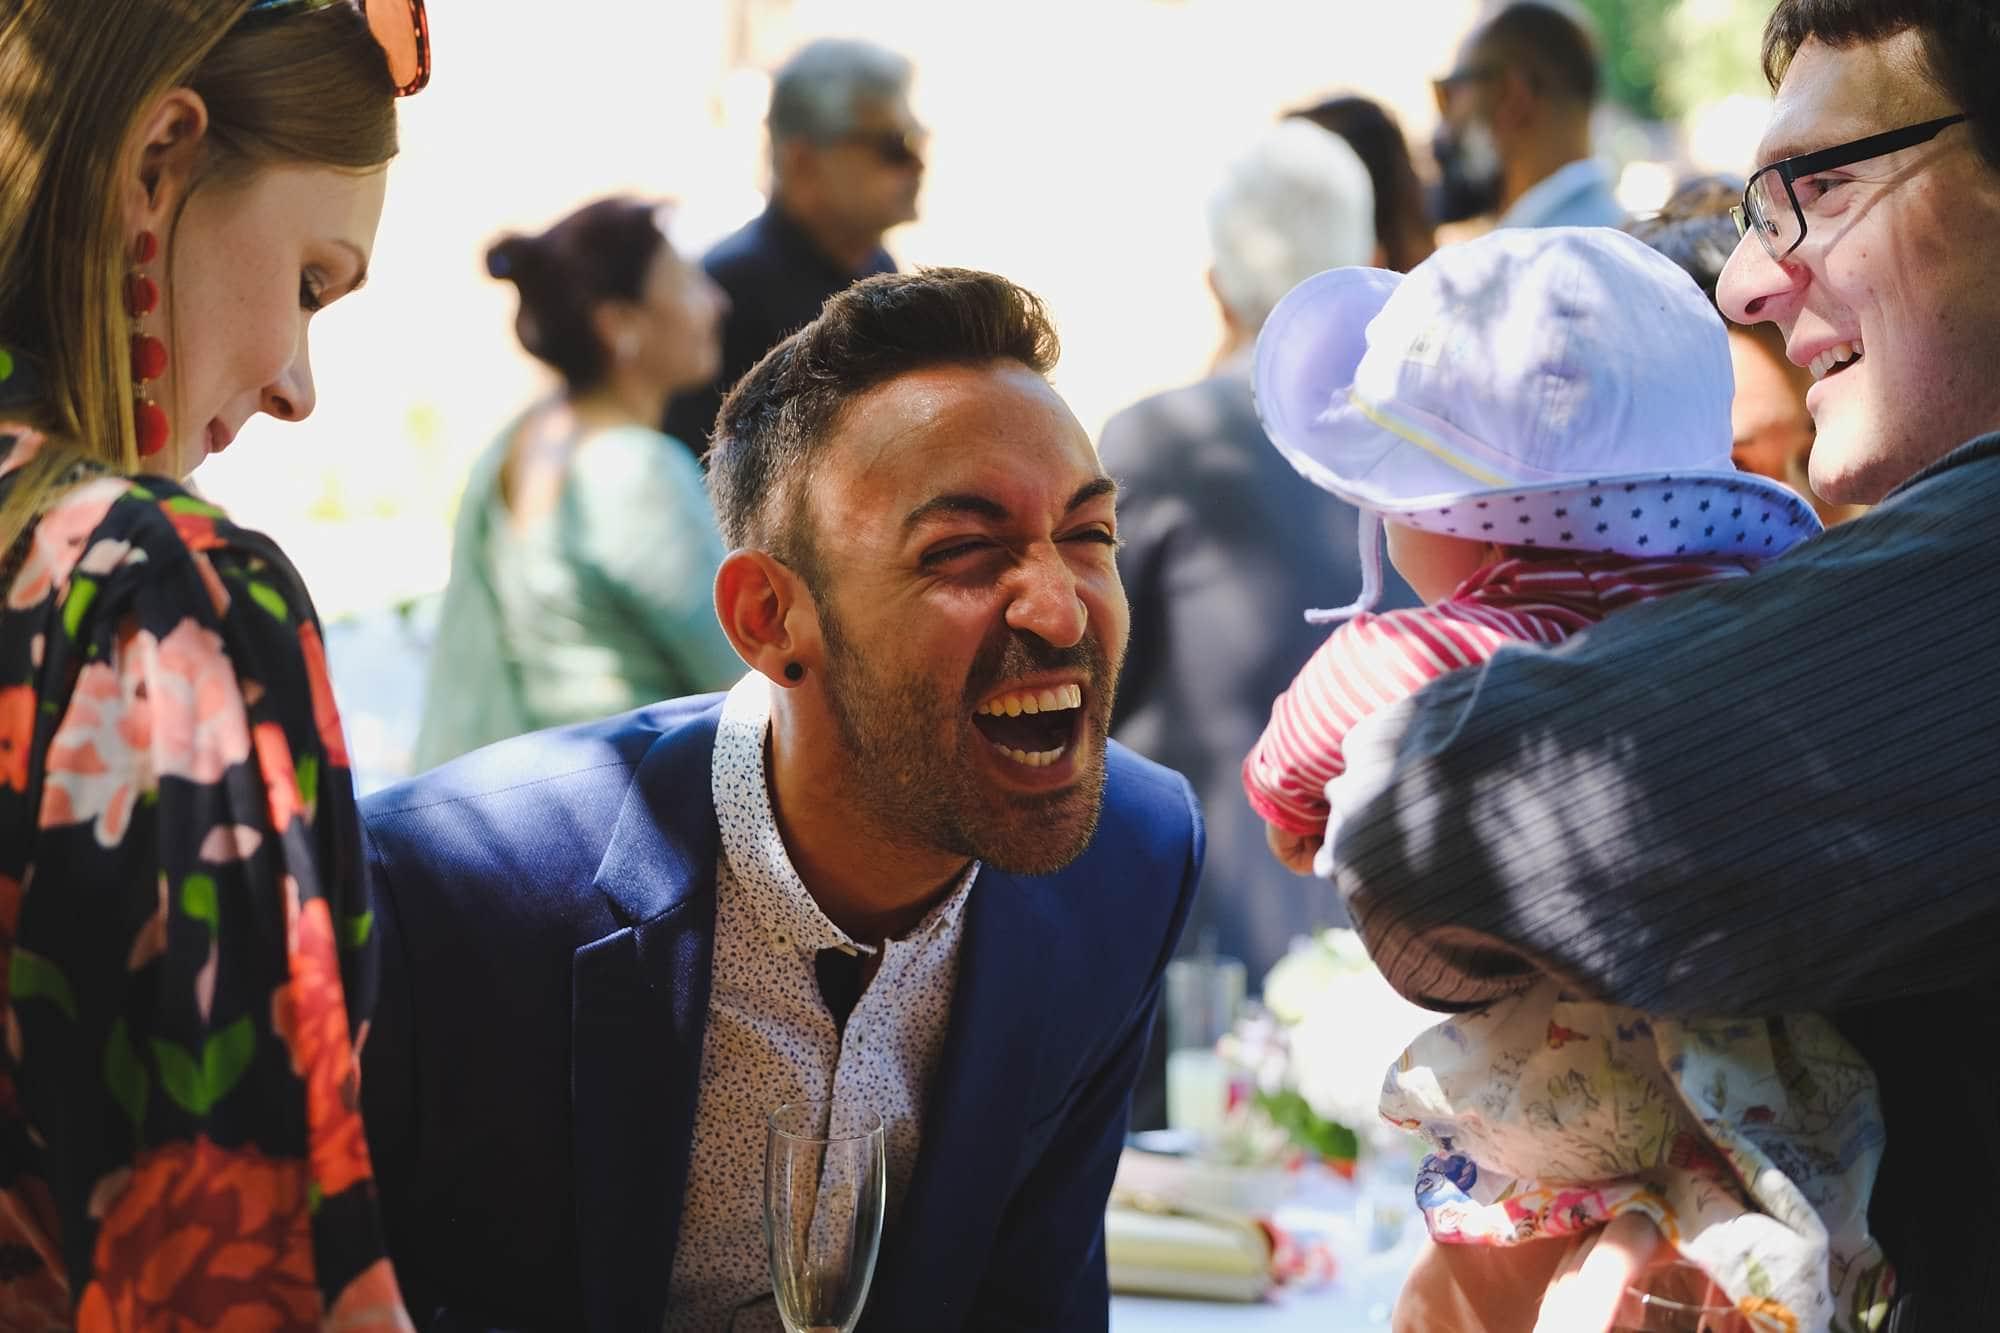 orangery holland park wedding reception 023 - Holland Park Orangery Wedding Photographer | Ayesha & Ritam